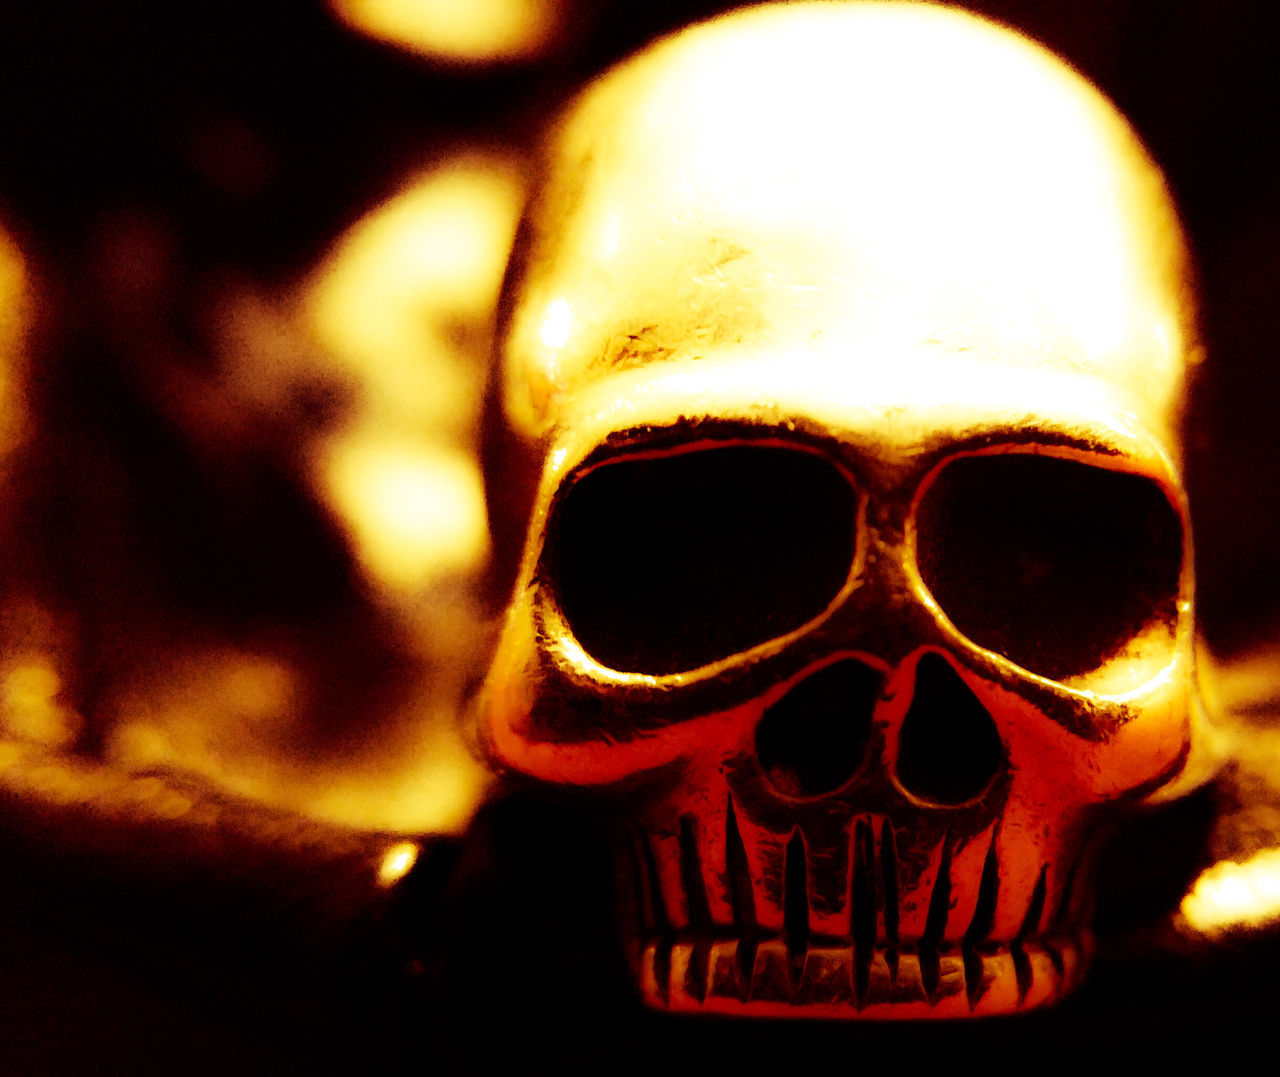 human skeleton, human skull, human bone, close-up, spooky, halloween, indoors, night, jack o lantern